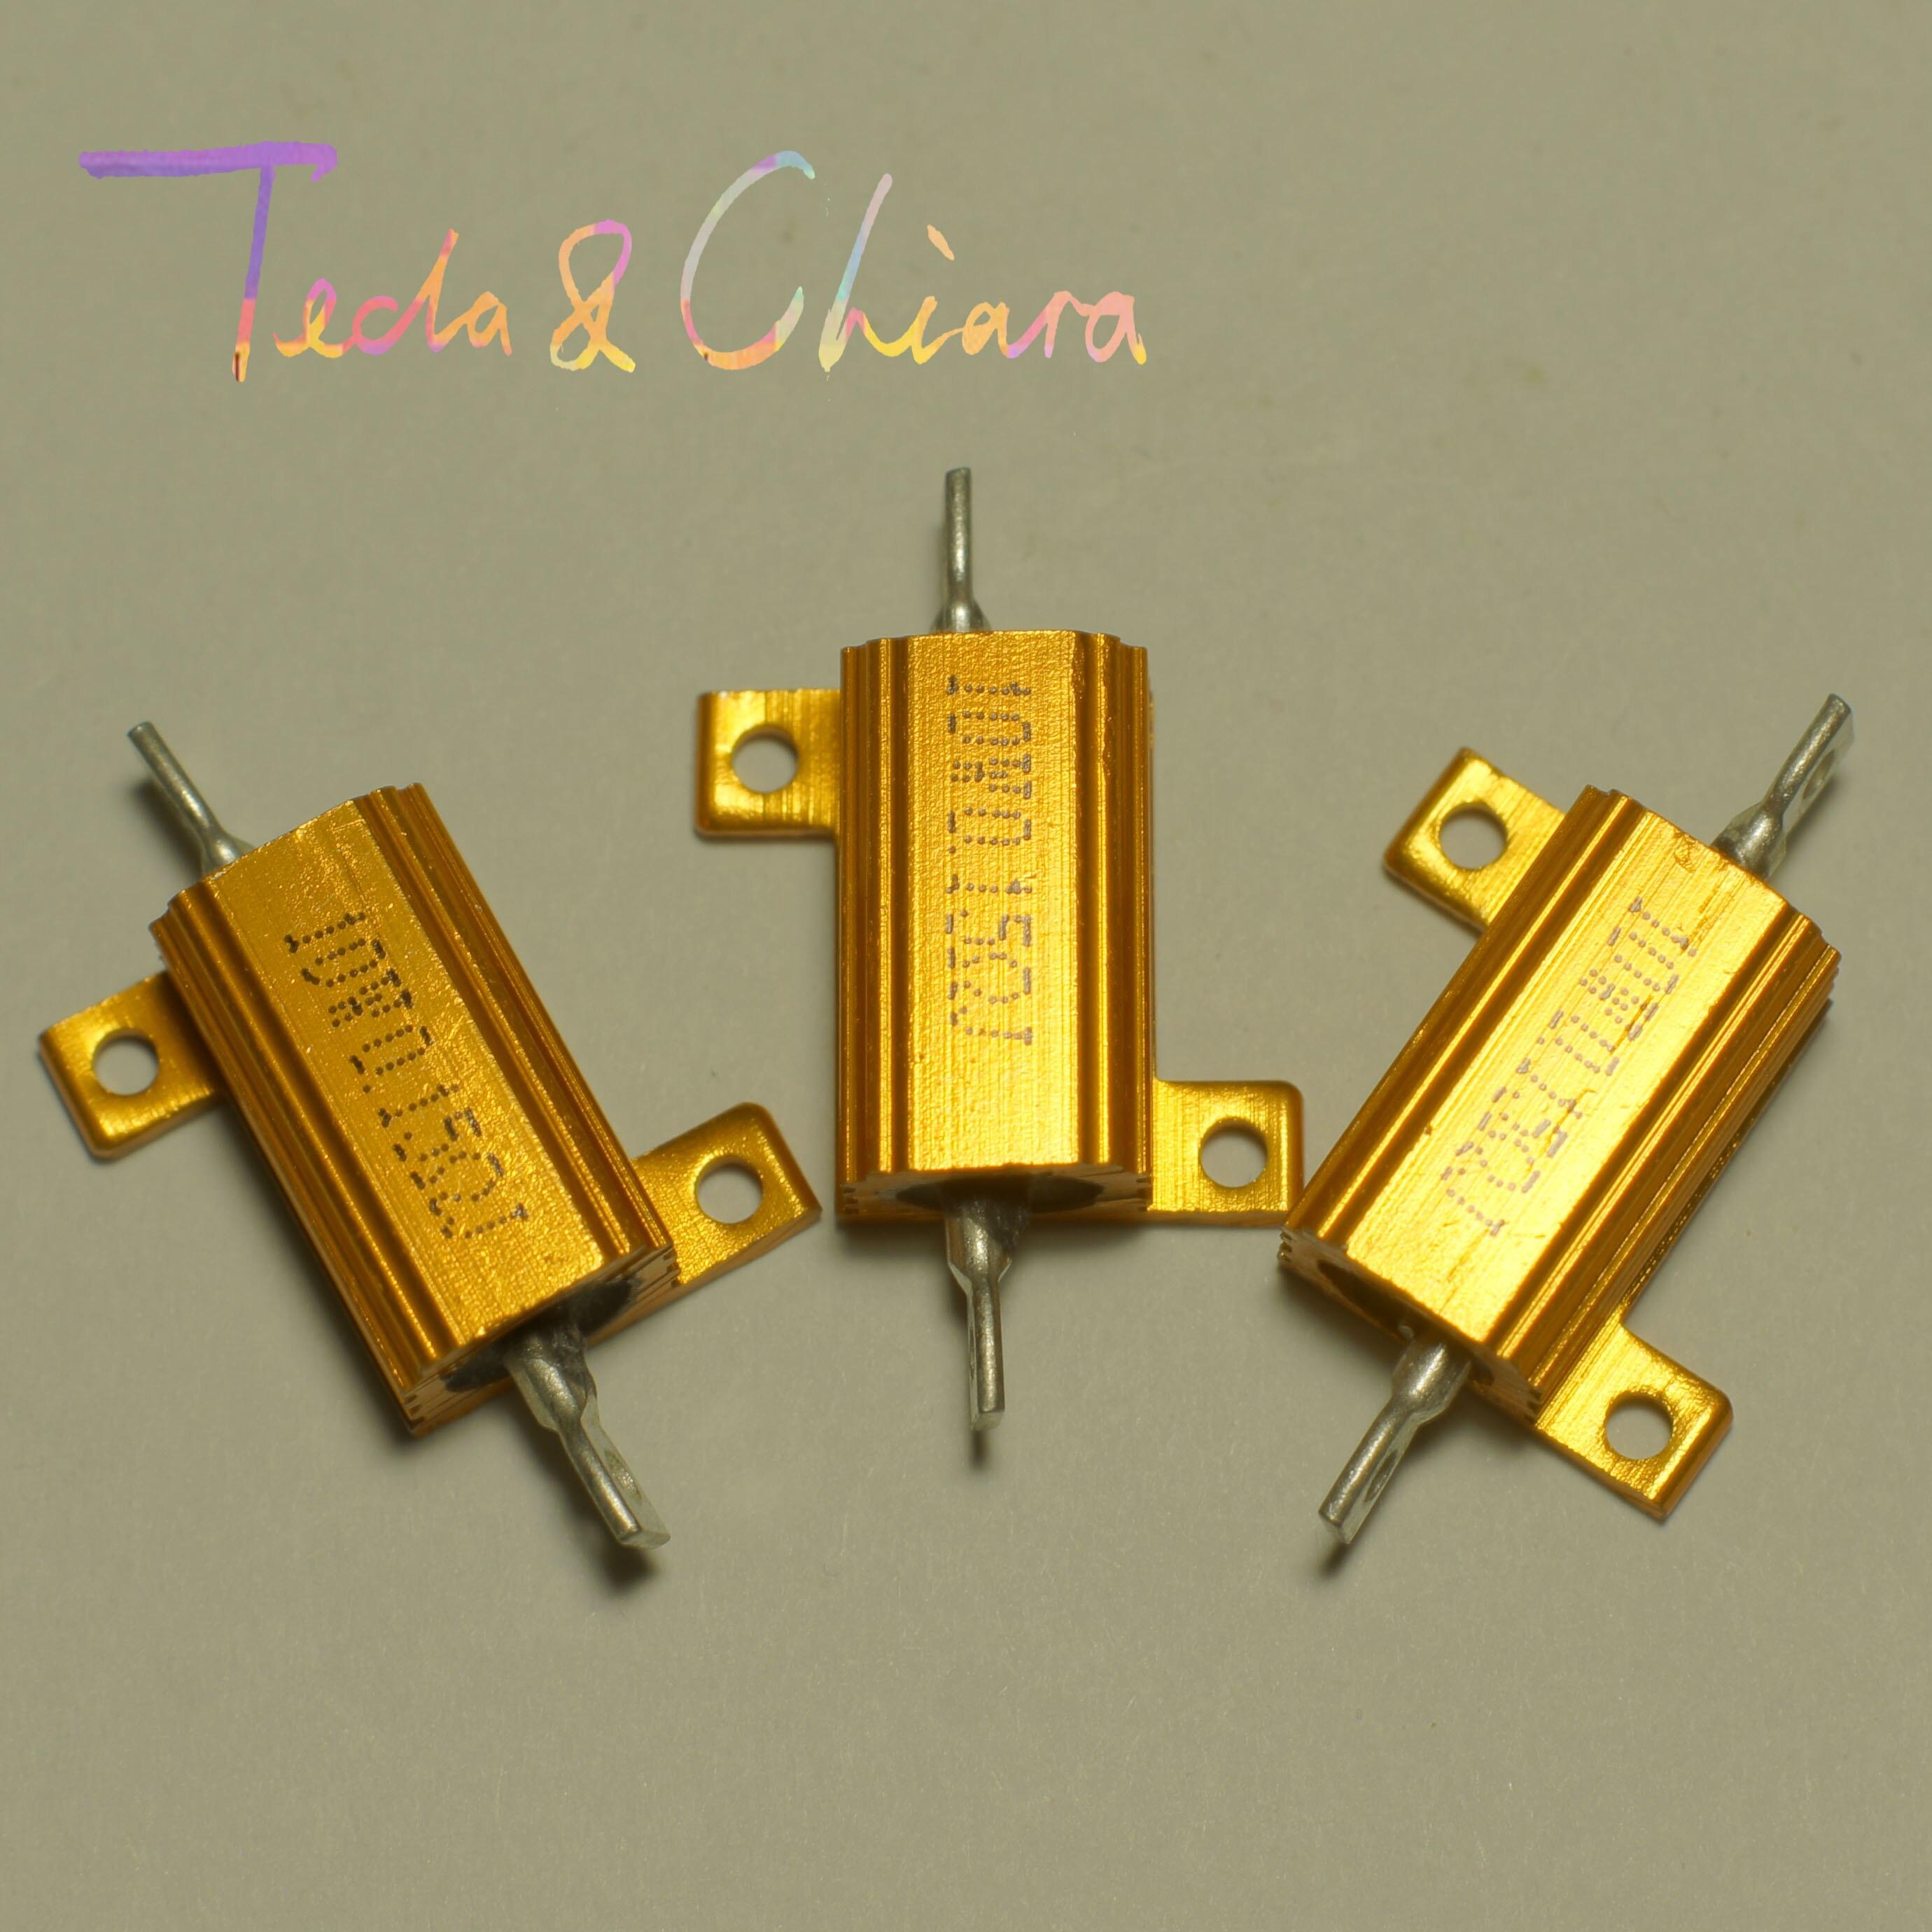 4.7R 4.7 4.7ohm 47R 47 47ohm R Ohm 10W Watt Gold Tone Wirewound Aluminum Power Metal Shell Case Resistance Resistor RX24 цена